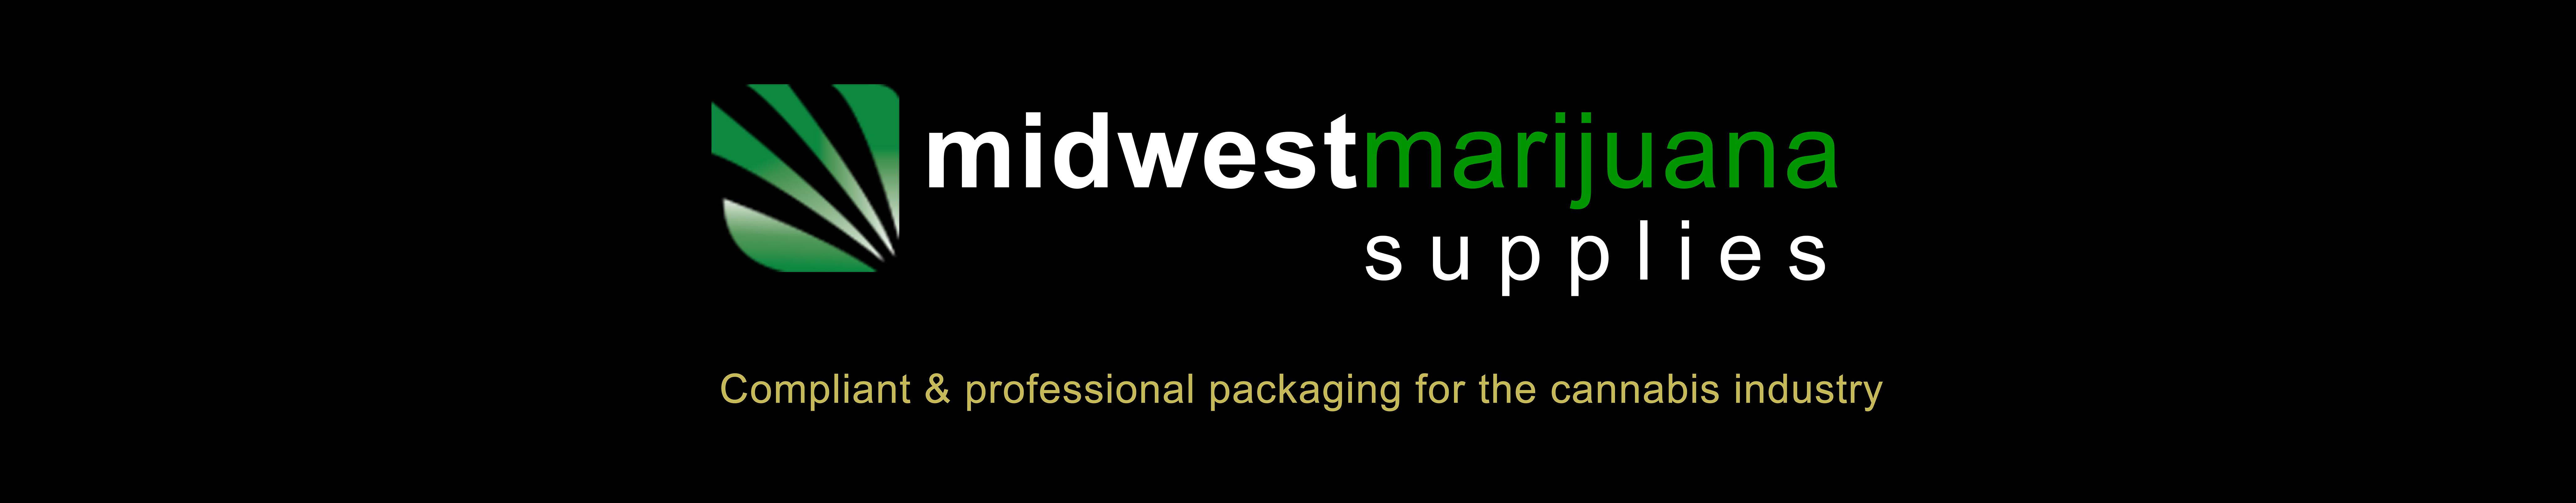 midwestmarijuanasupplies-logo-v2.jpg